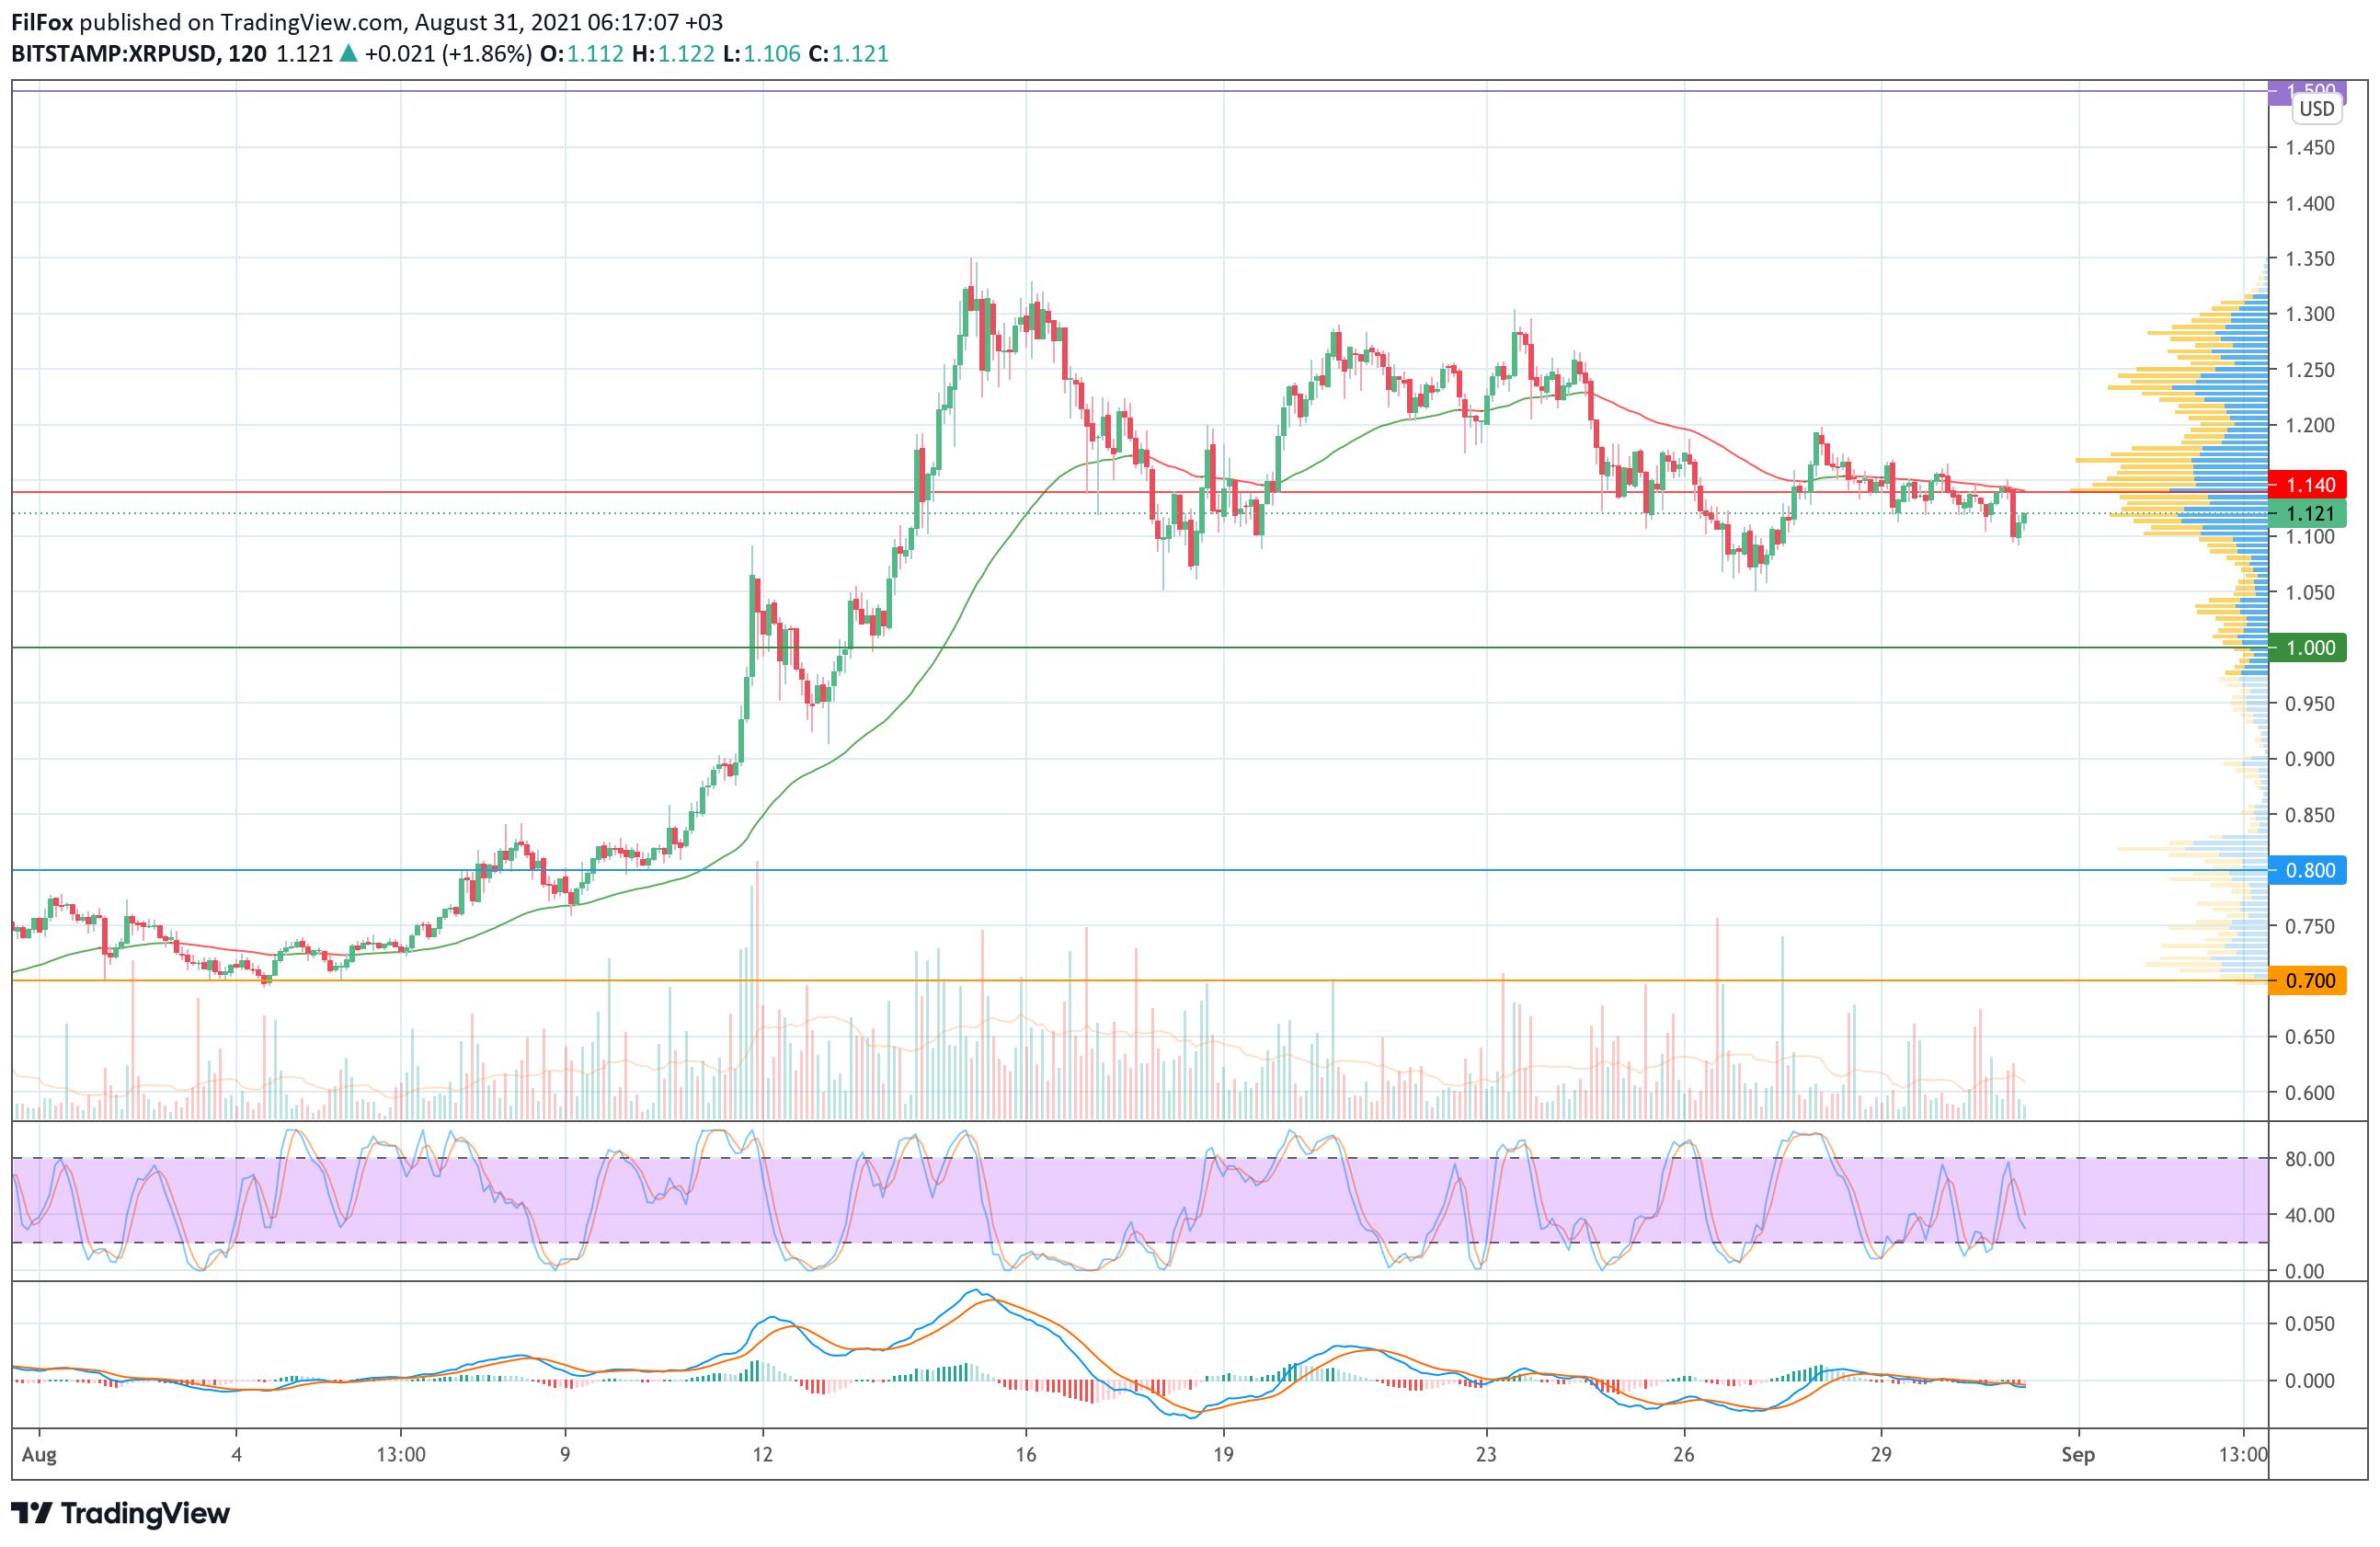 Анализ цен Bitcoin, Ethereum, XRP на 31.08.2021